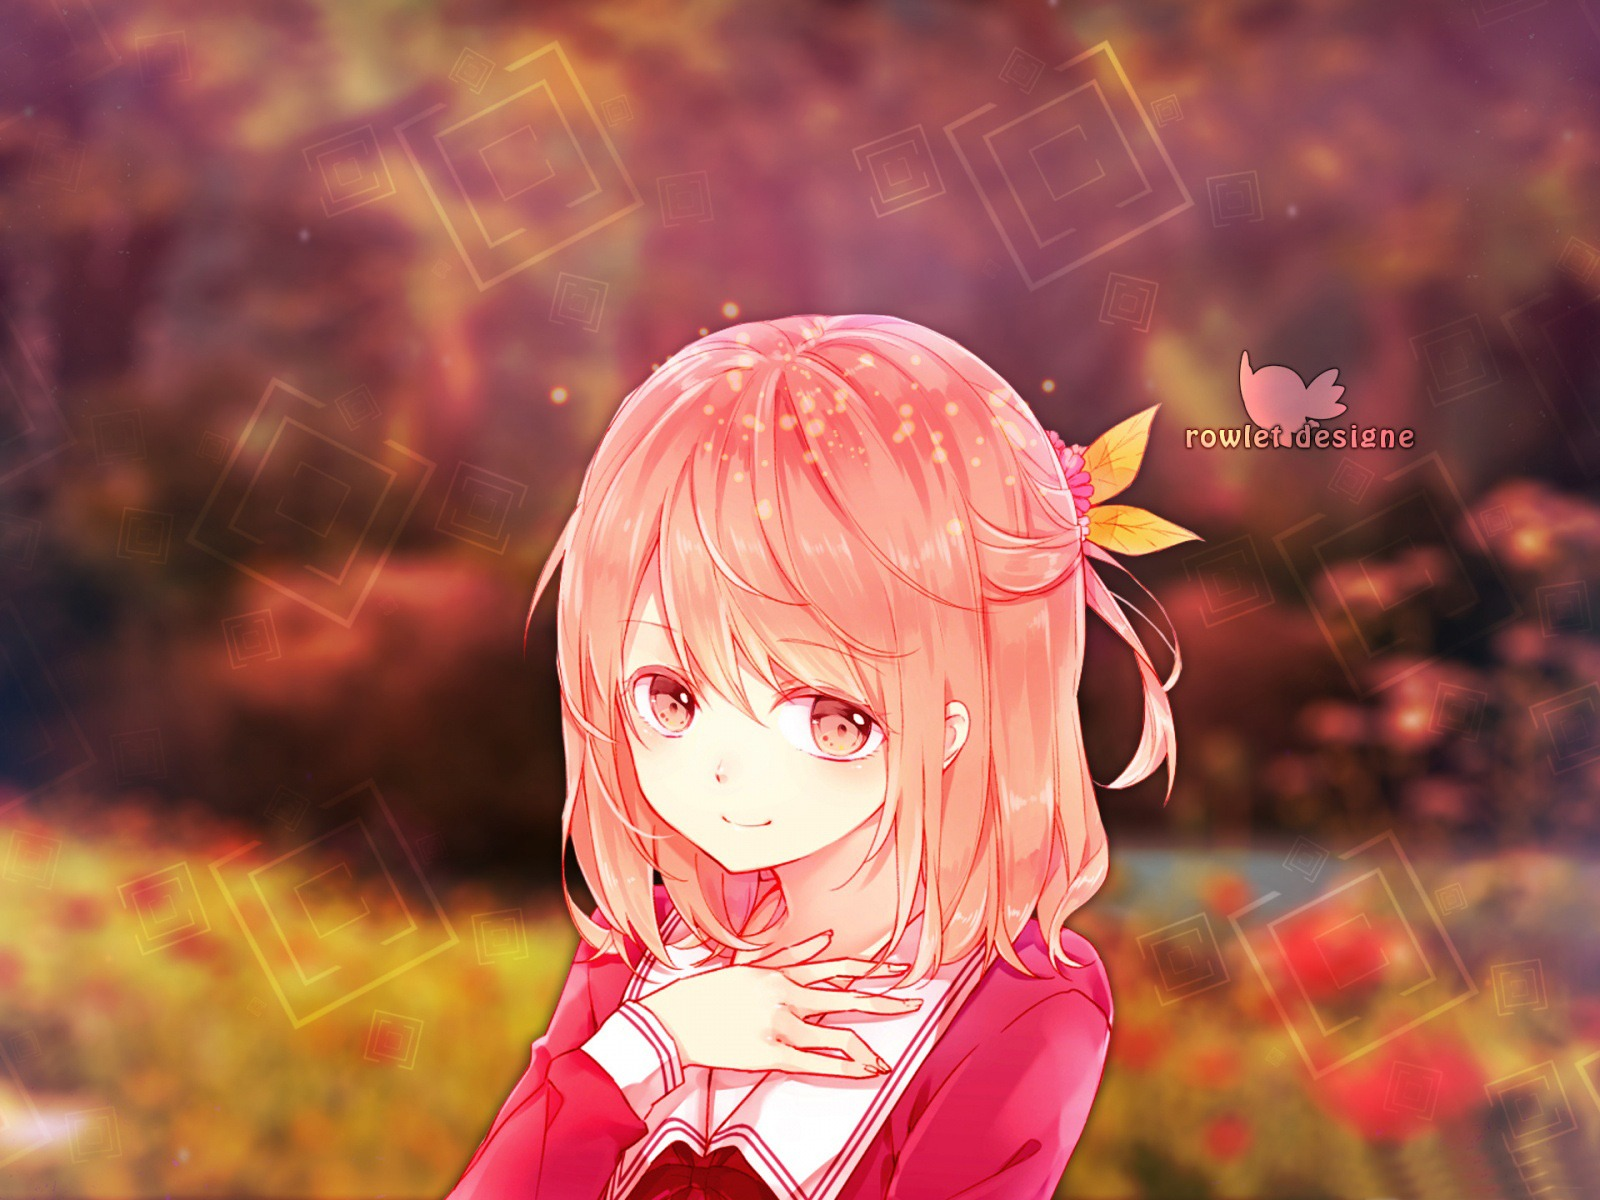 Cute Anime Girl High Definition Wallpaper 21556 - Baltana